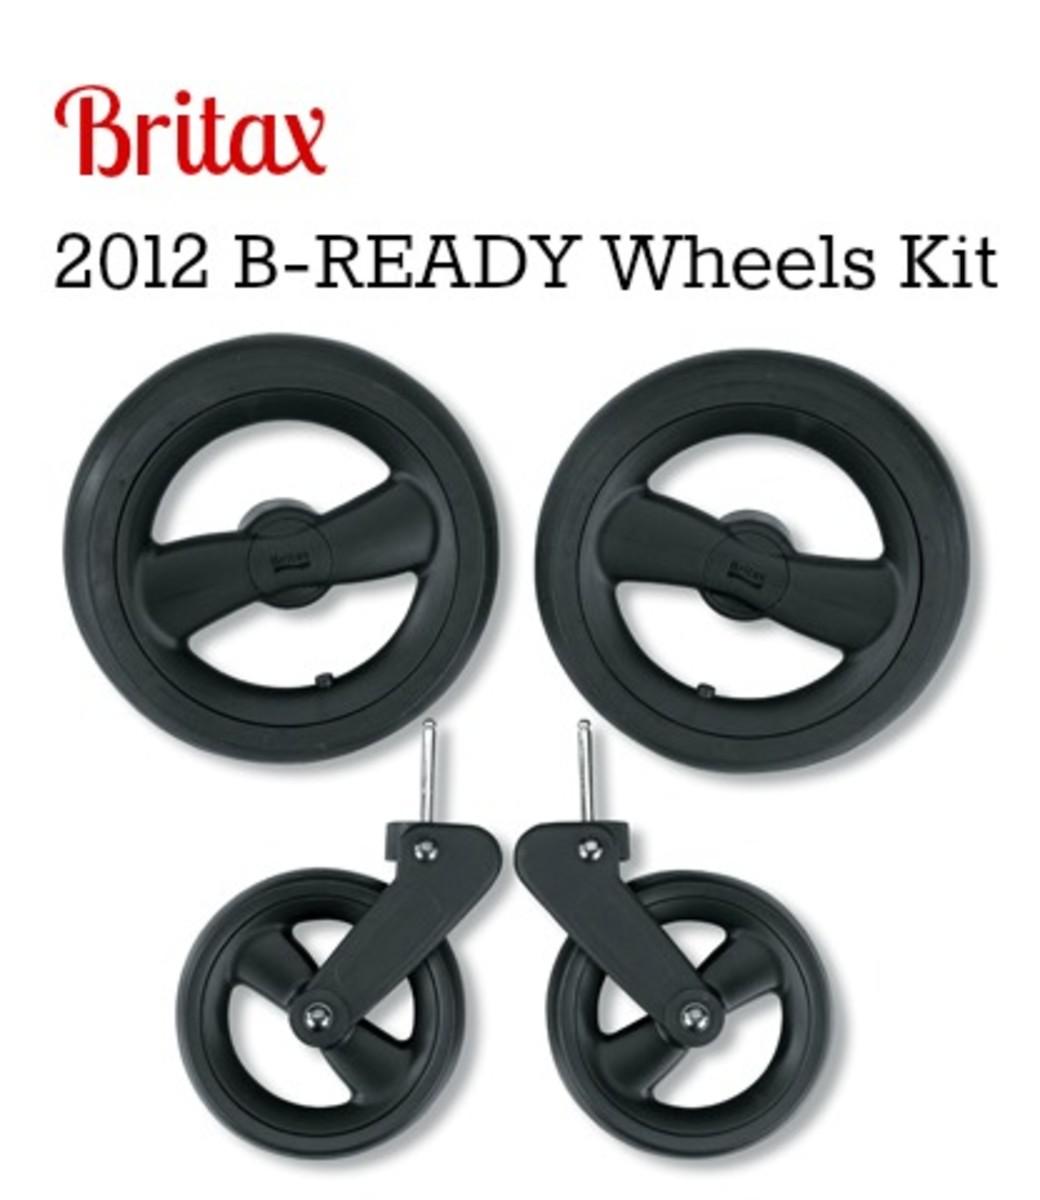 britax-2012-b-ready-wheel-kit